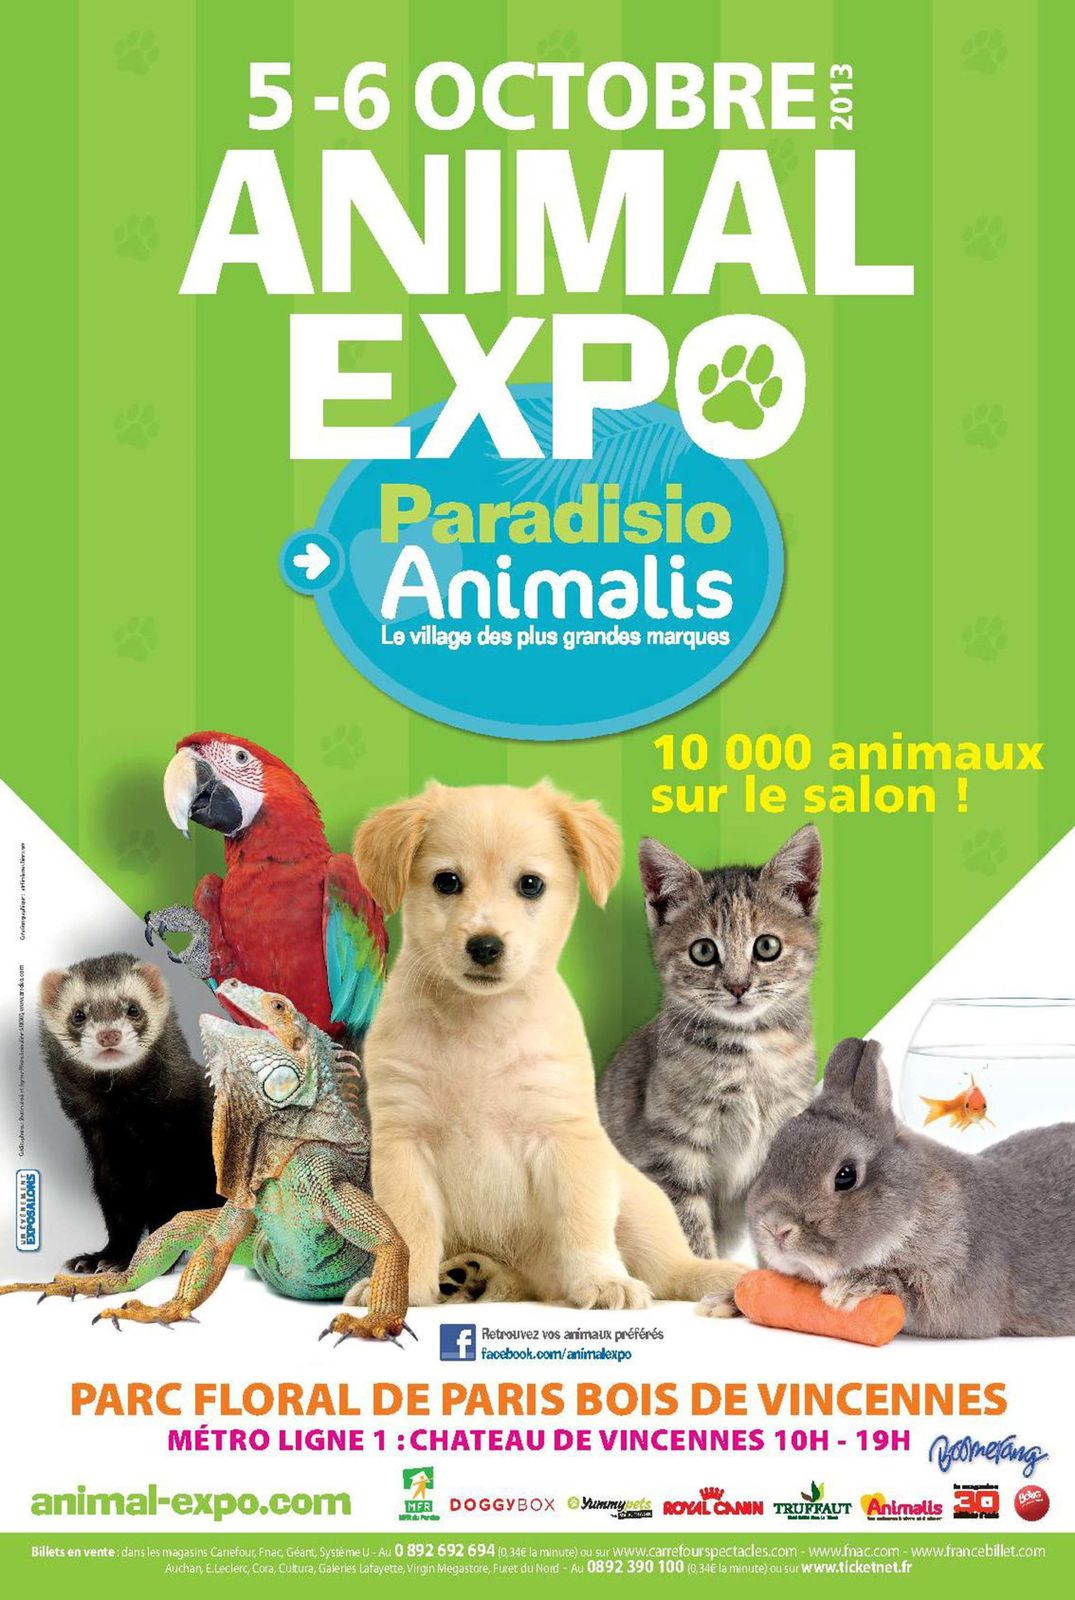 Animal expo 5 octobre 2013 paris